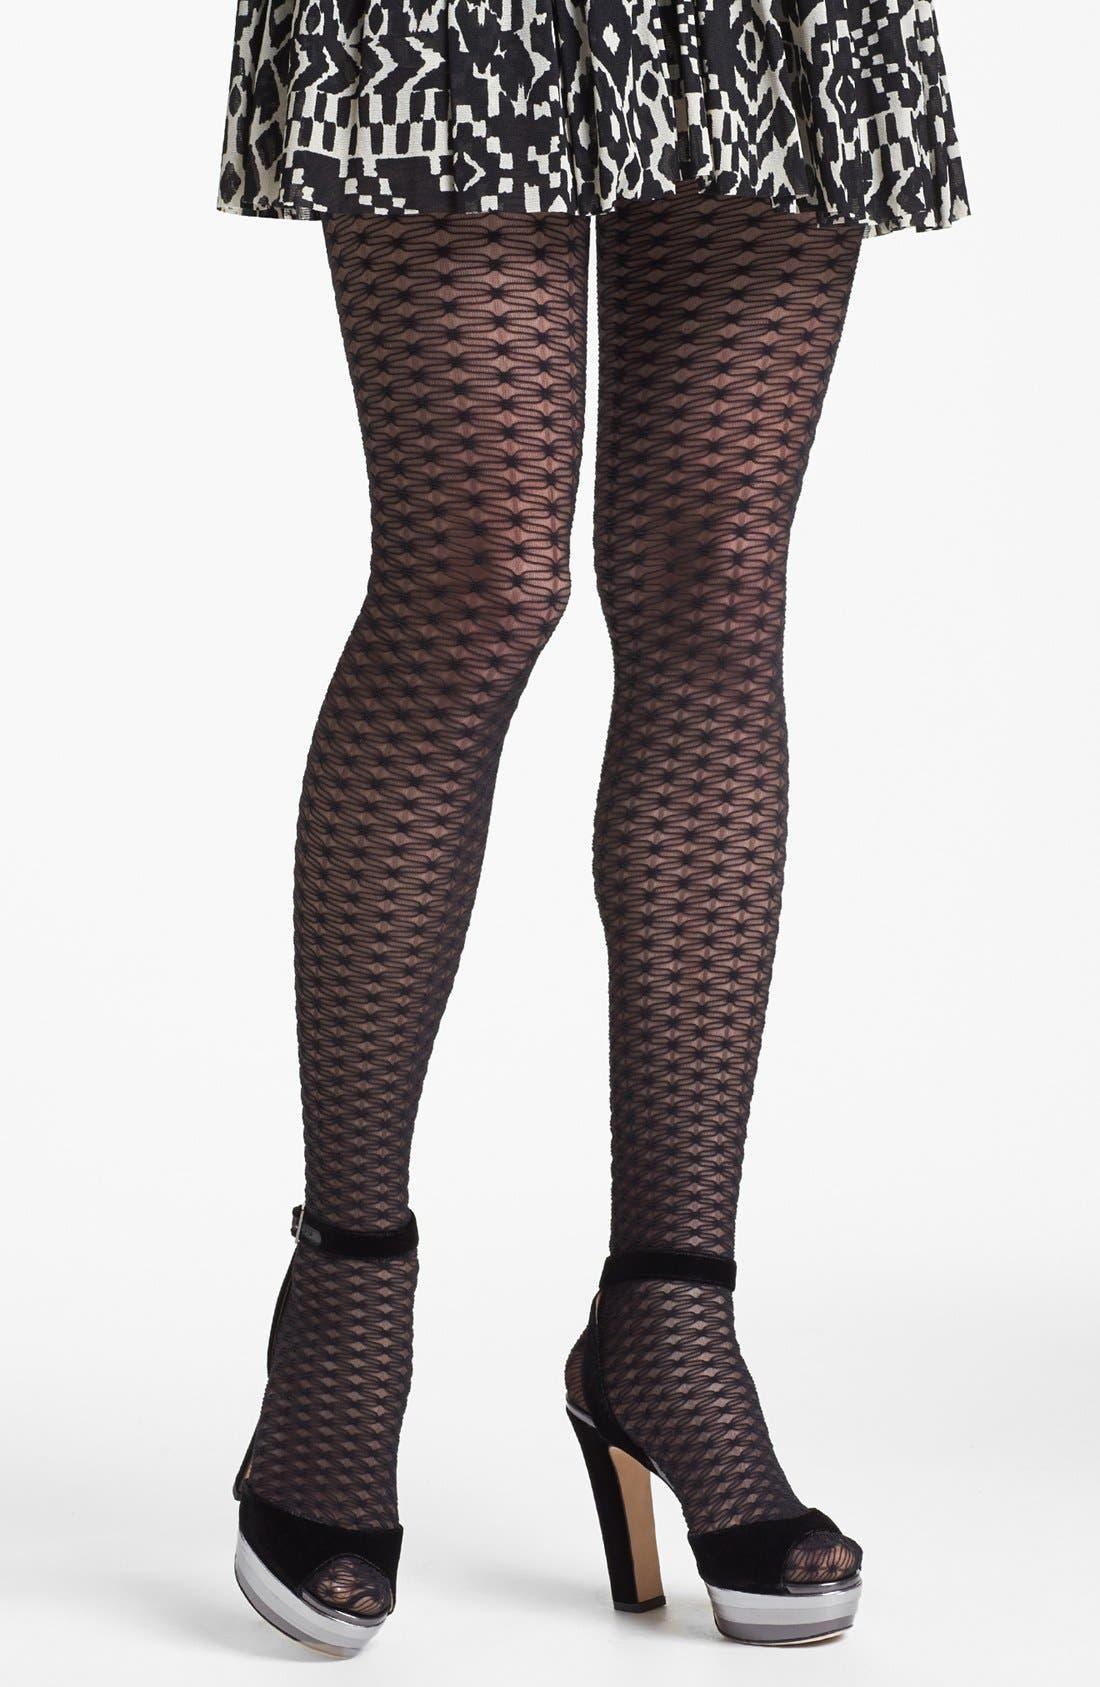 Alternate Image 1 Selected - Calvin Klein Sheer Texture Pantyhose